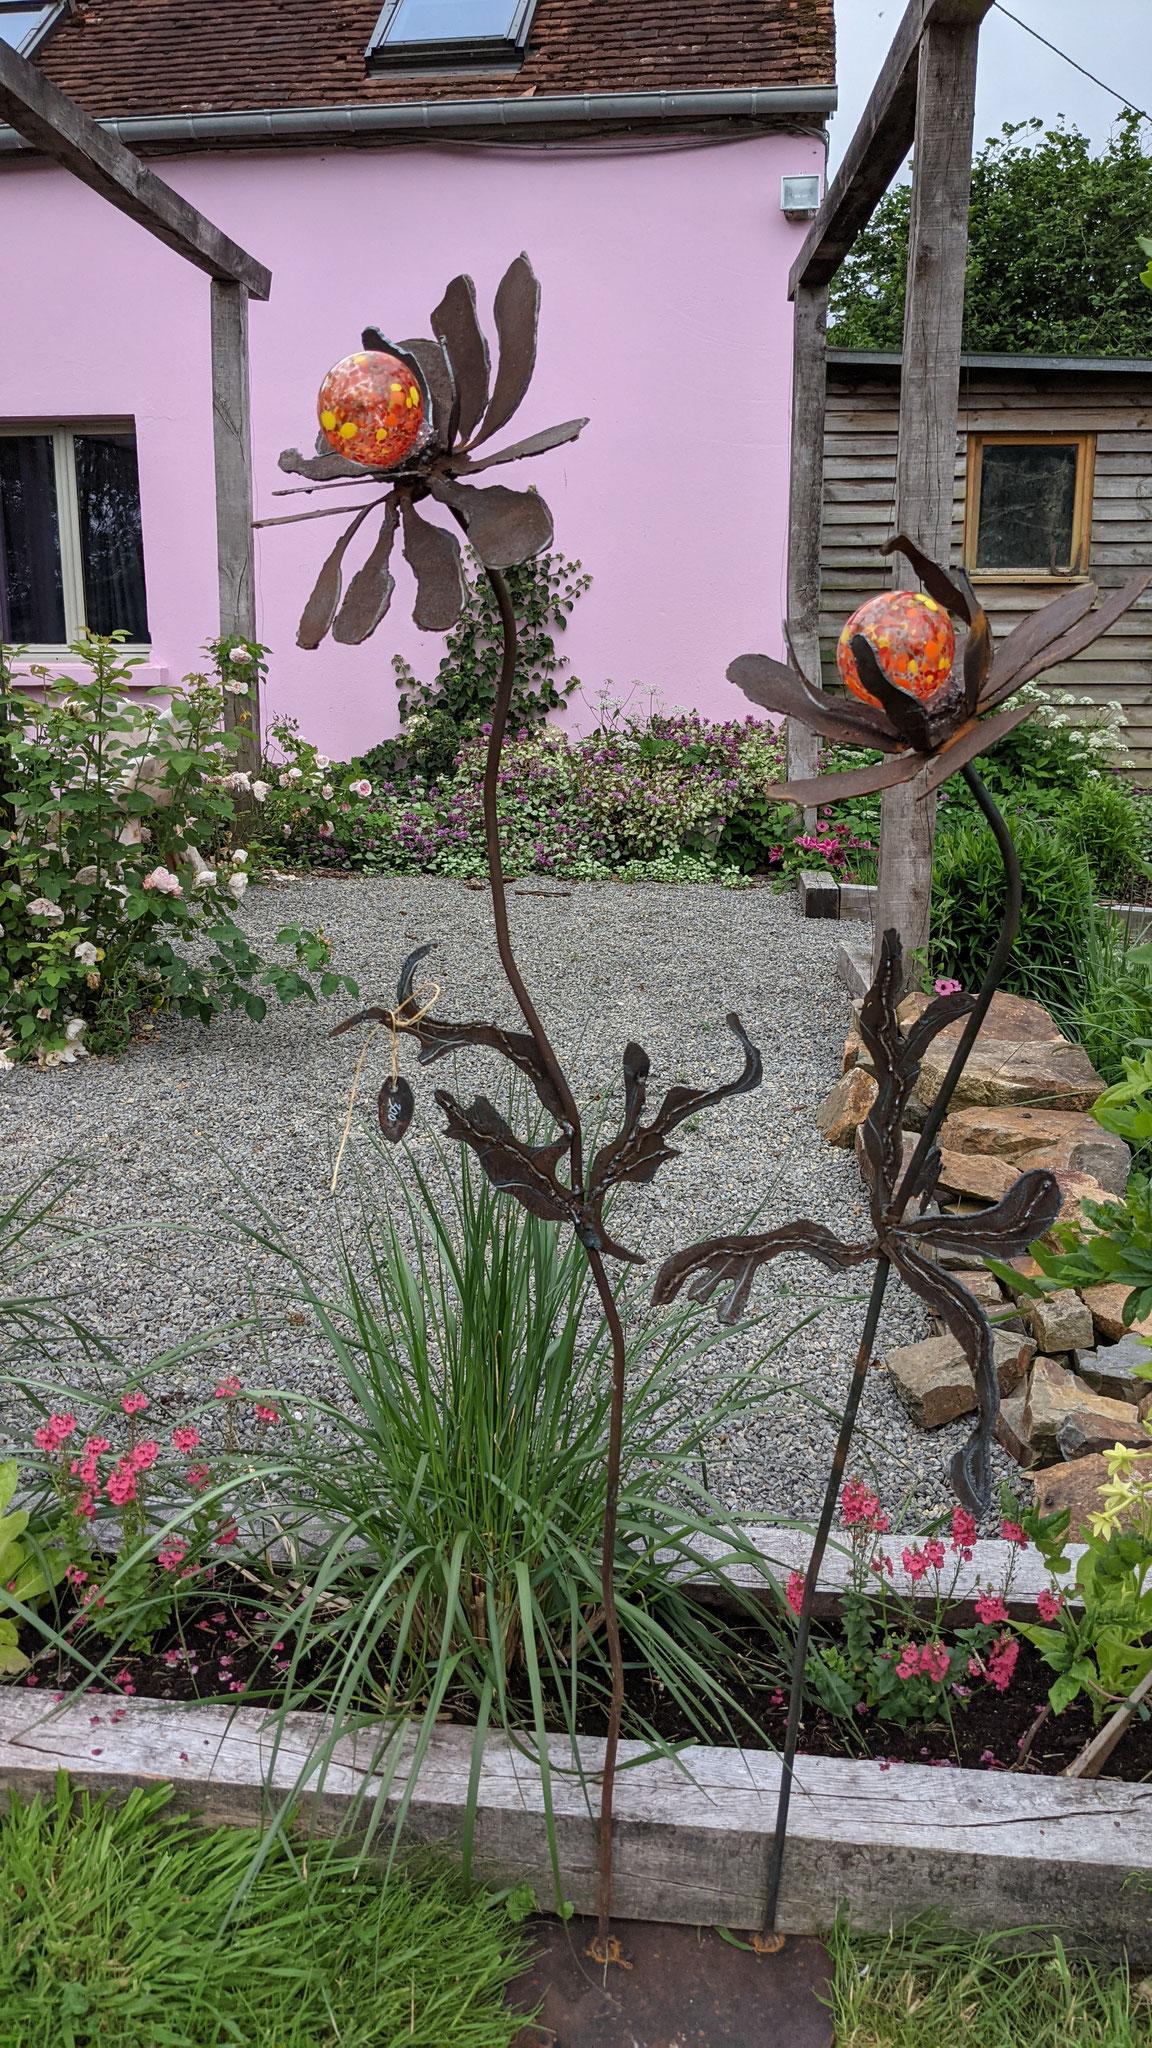 The English Garden & Nadine Ledru création